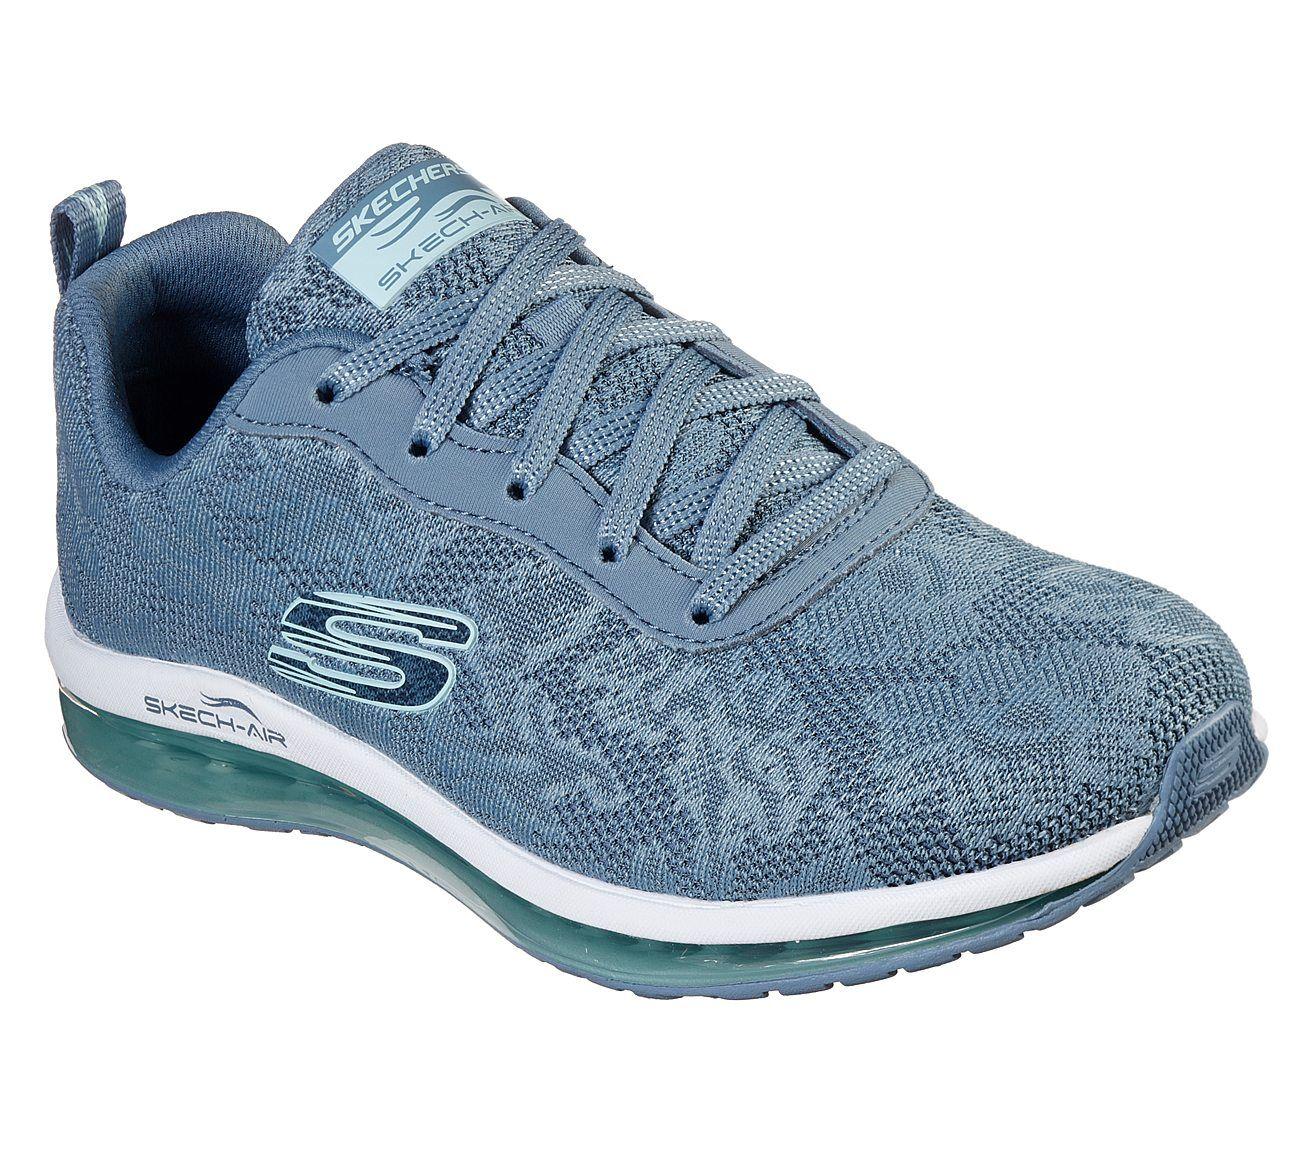 Skechers Skech Air Element Walkout | 18 Patterned Sneakers